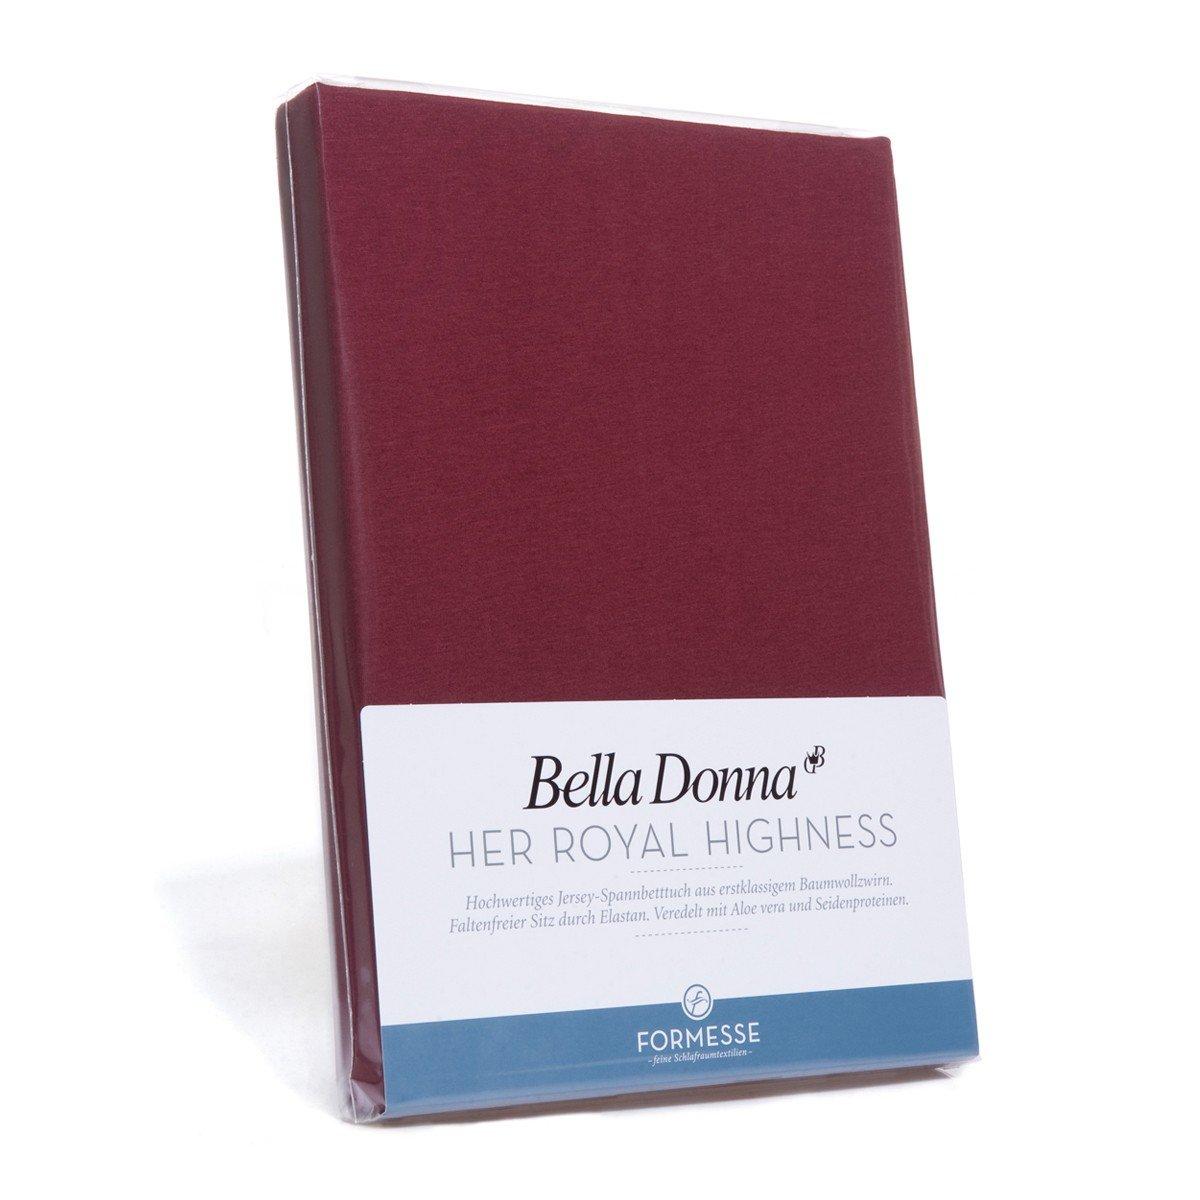 Formesse Bella-Damenschuhe Jersey Spannbettlaken platin, 200x220 - 200x240 cm